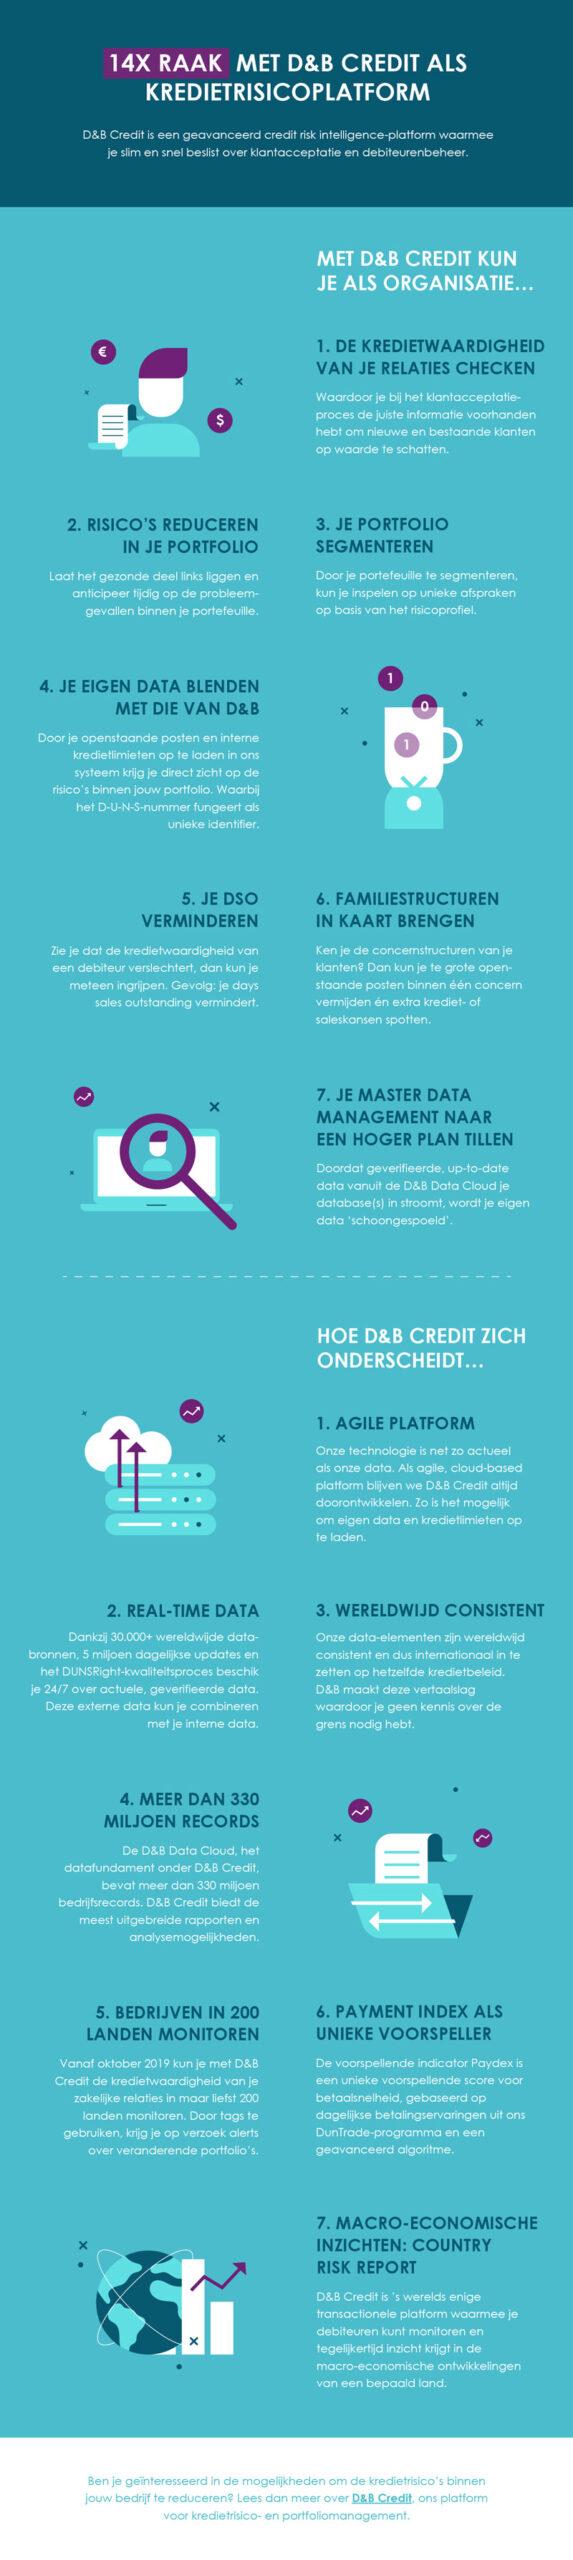 14x raak met D&B Credit als kredietrisicoplatform